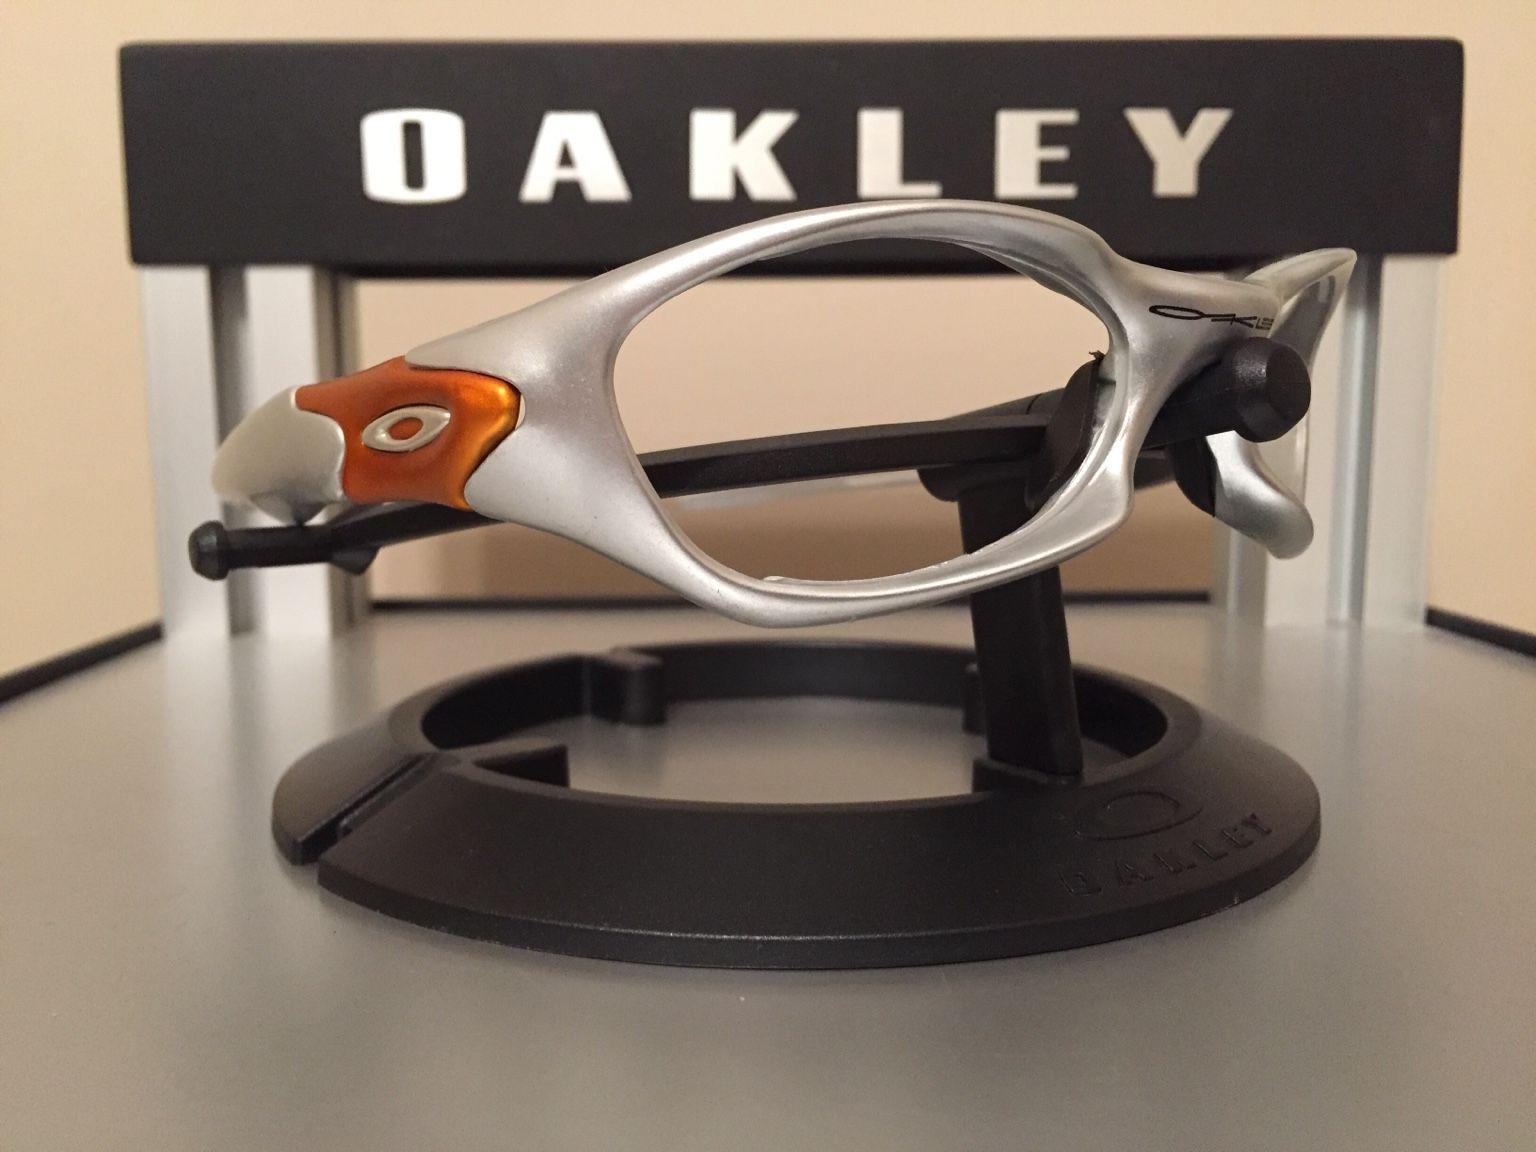 Oakley Valve 1.0 Bundle.......$110 - 80034682d4f55fbabb45887ccaa4ac1b.jpg